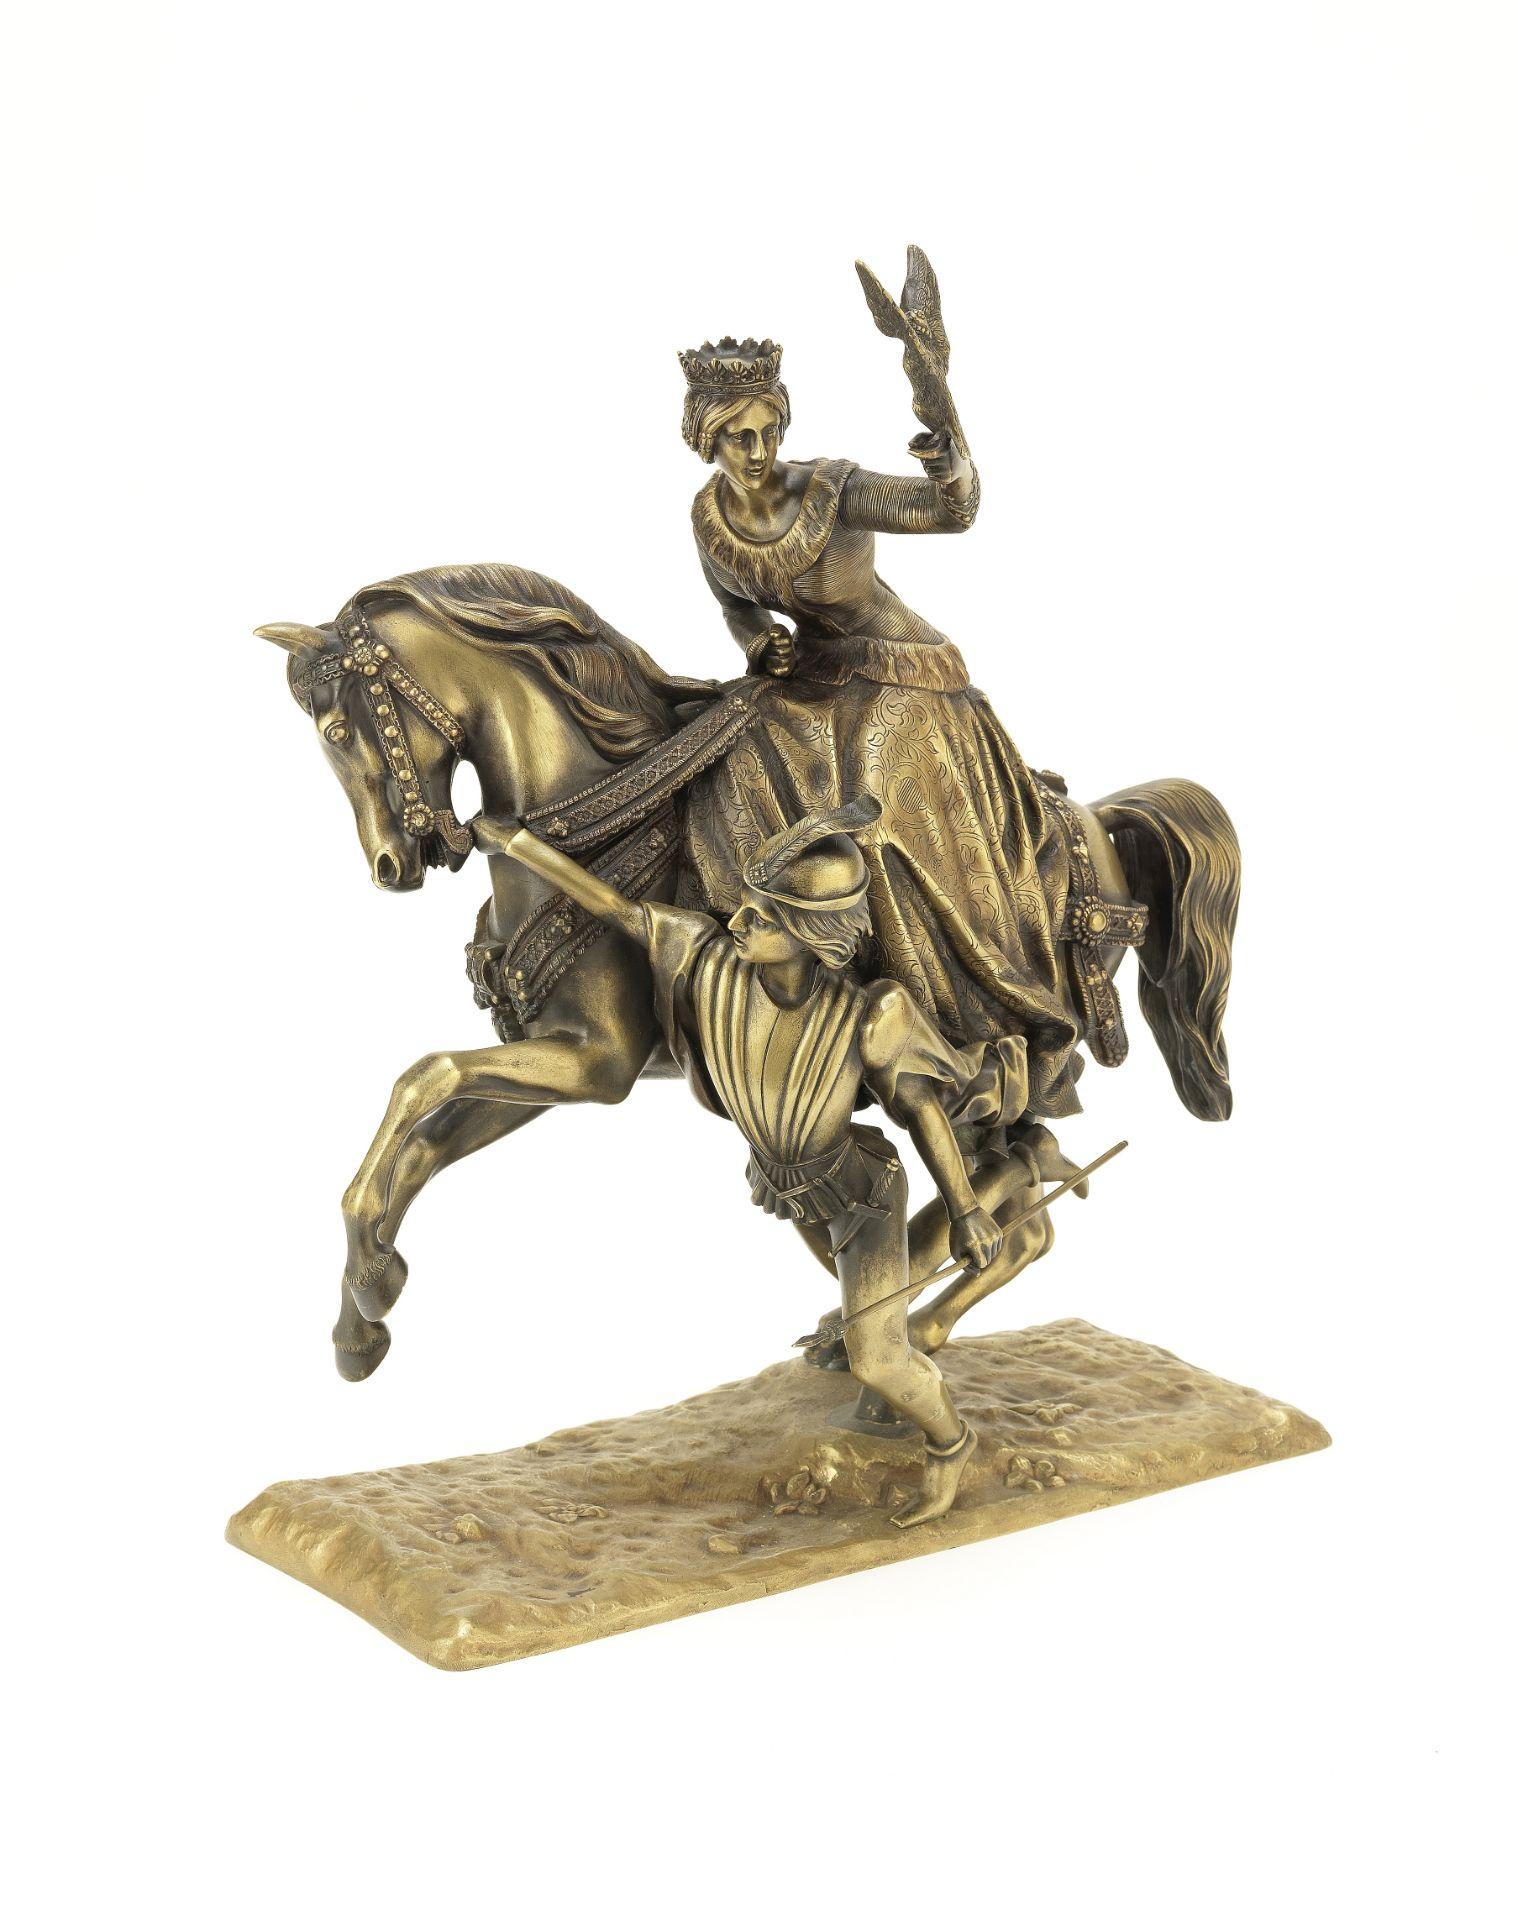 Los 63 - A 19th century bronze equestrian figure of Eleanor of Aquitaine